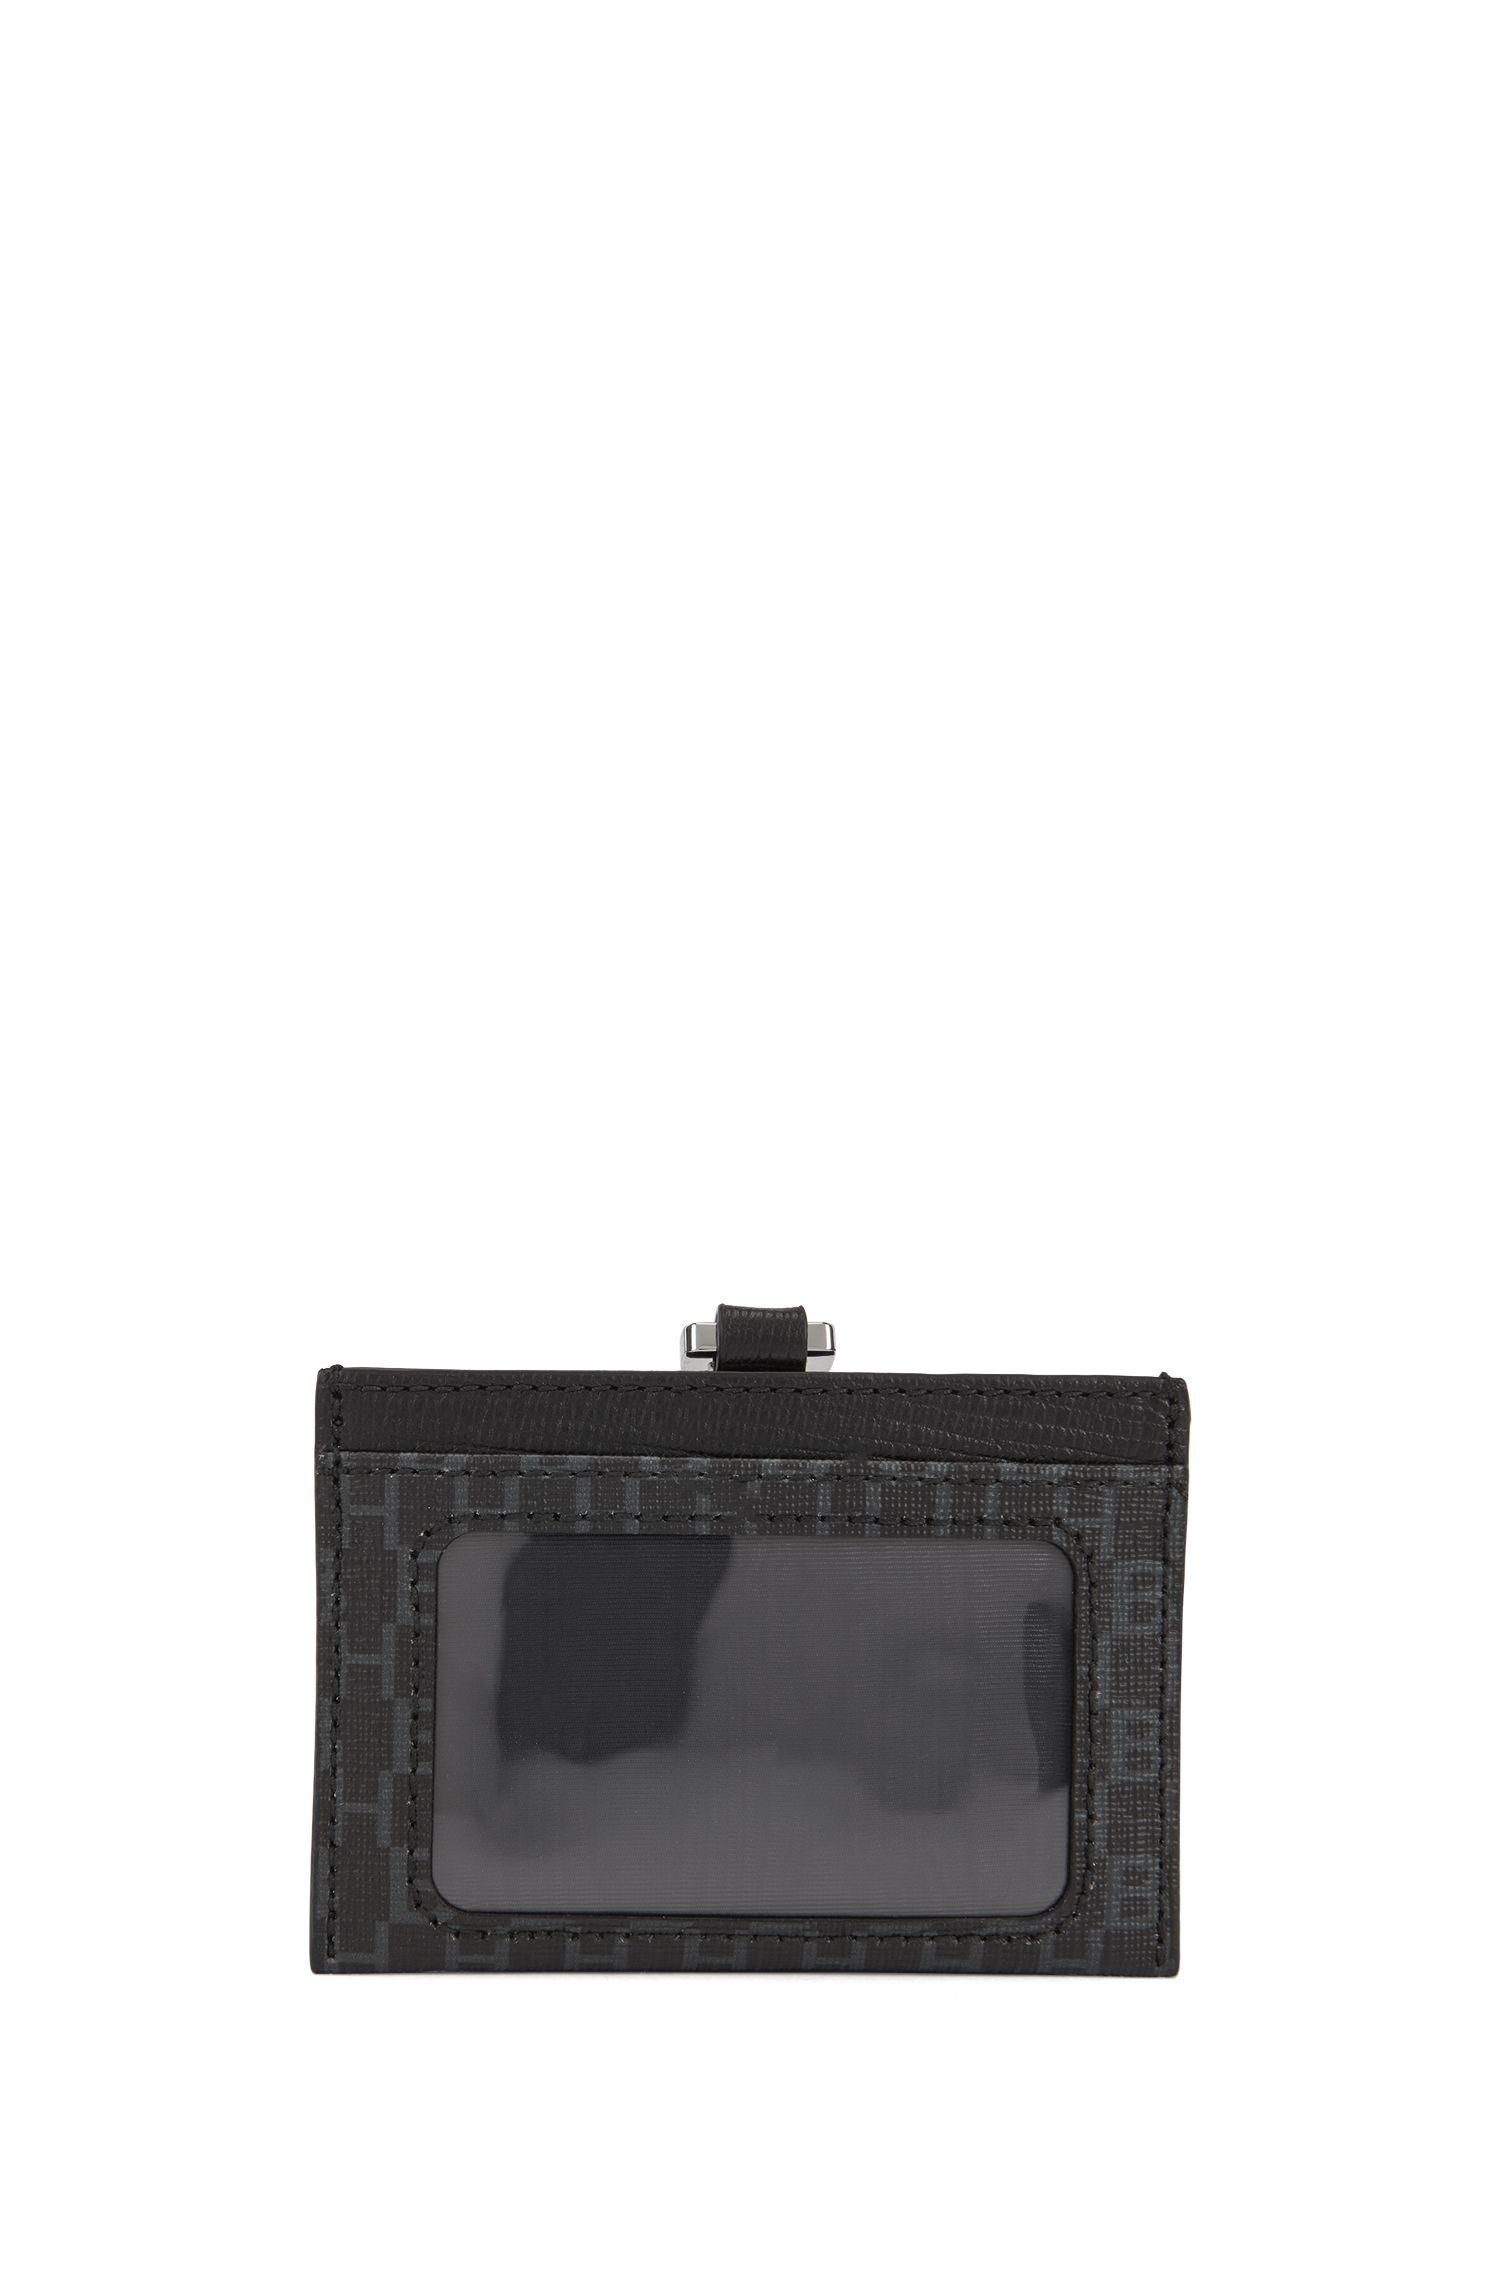 Monogram logo-print ID holder in Italian coated fabric, Black